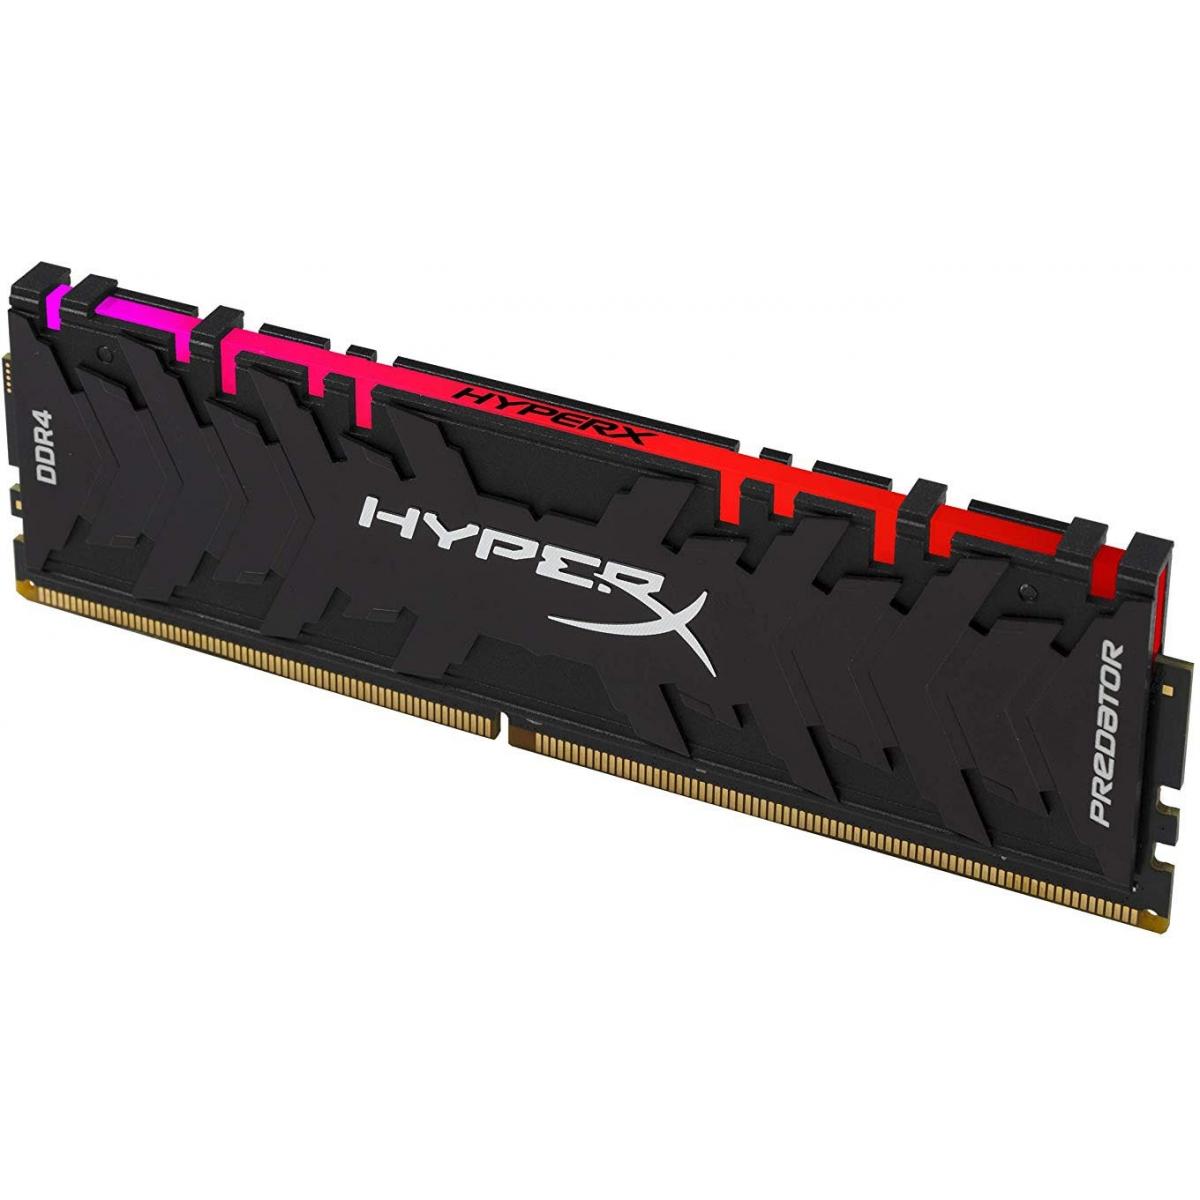 Memória DDR4 Kingston HyperX Predator RGB, 16GB 3200MHz, HX432C16PB3A/16